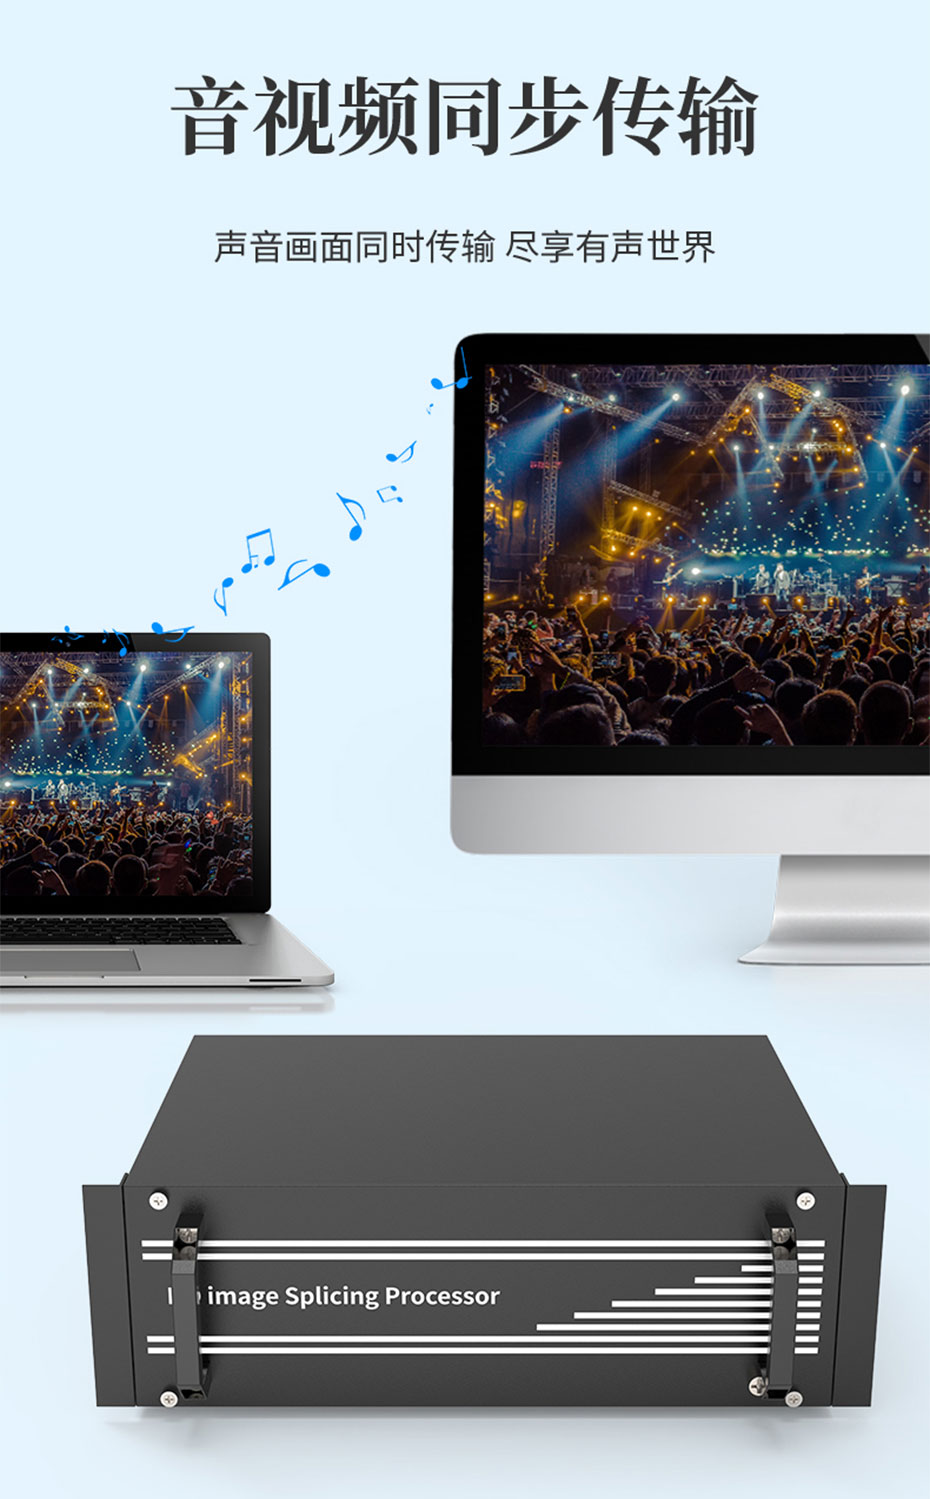 HDMI多屏/多画面拼接处理器HD218支持音视频同步传输